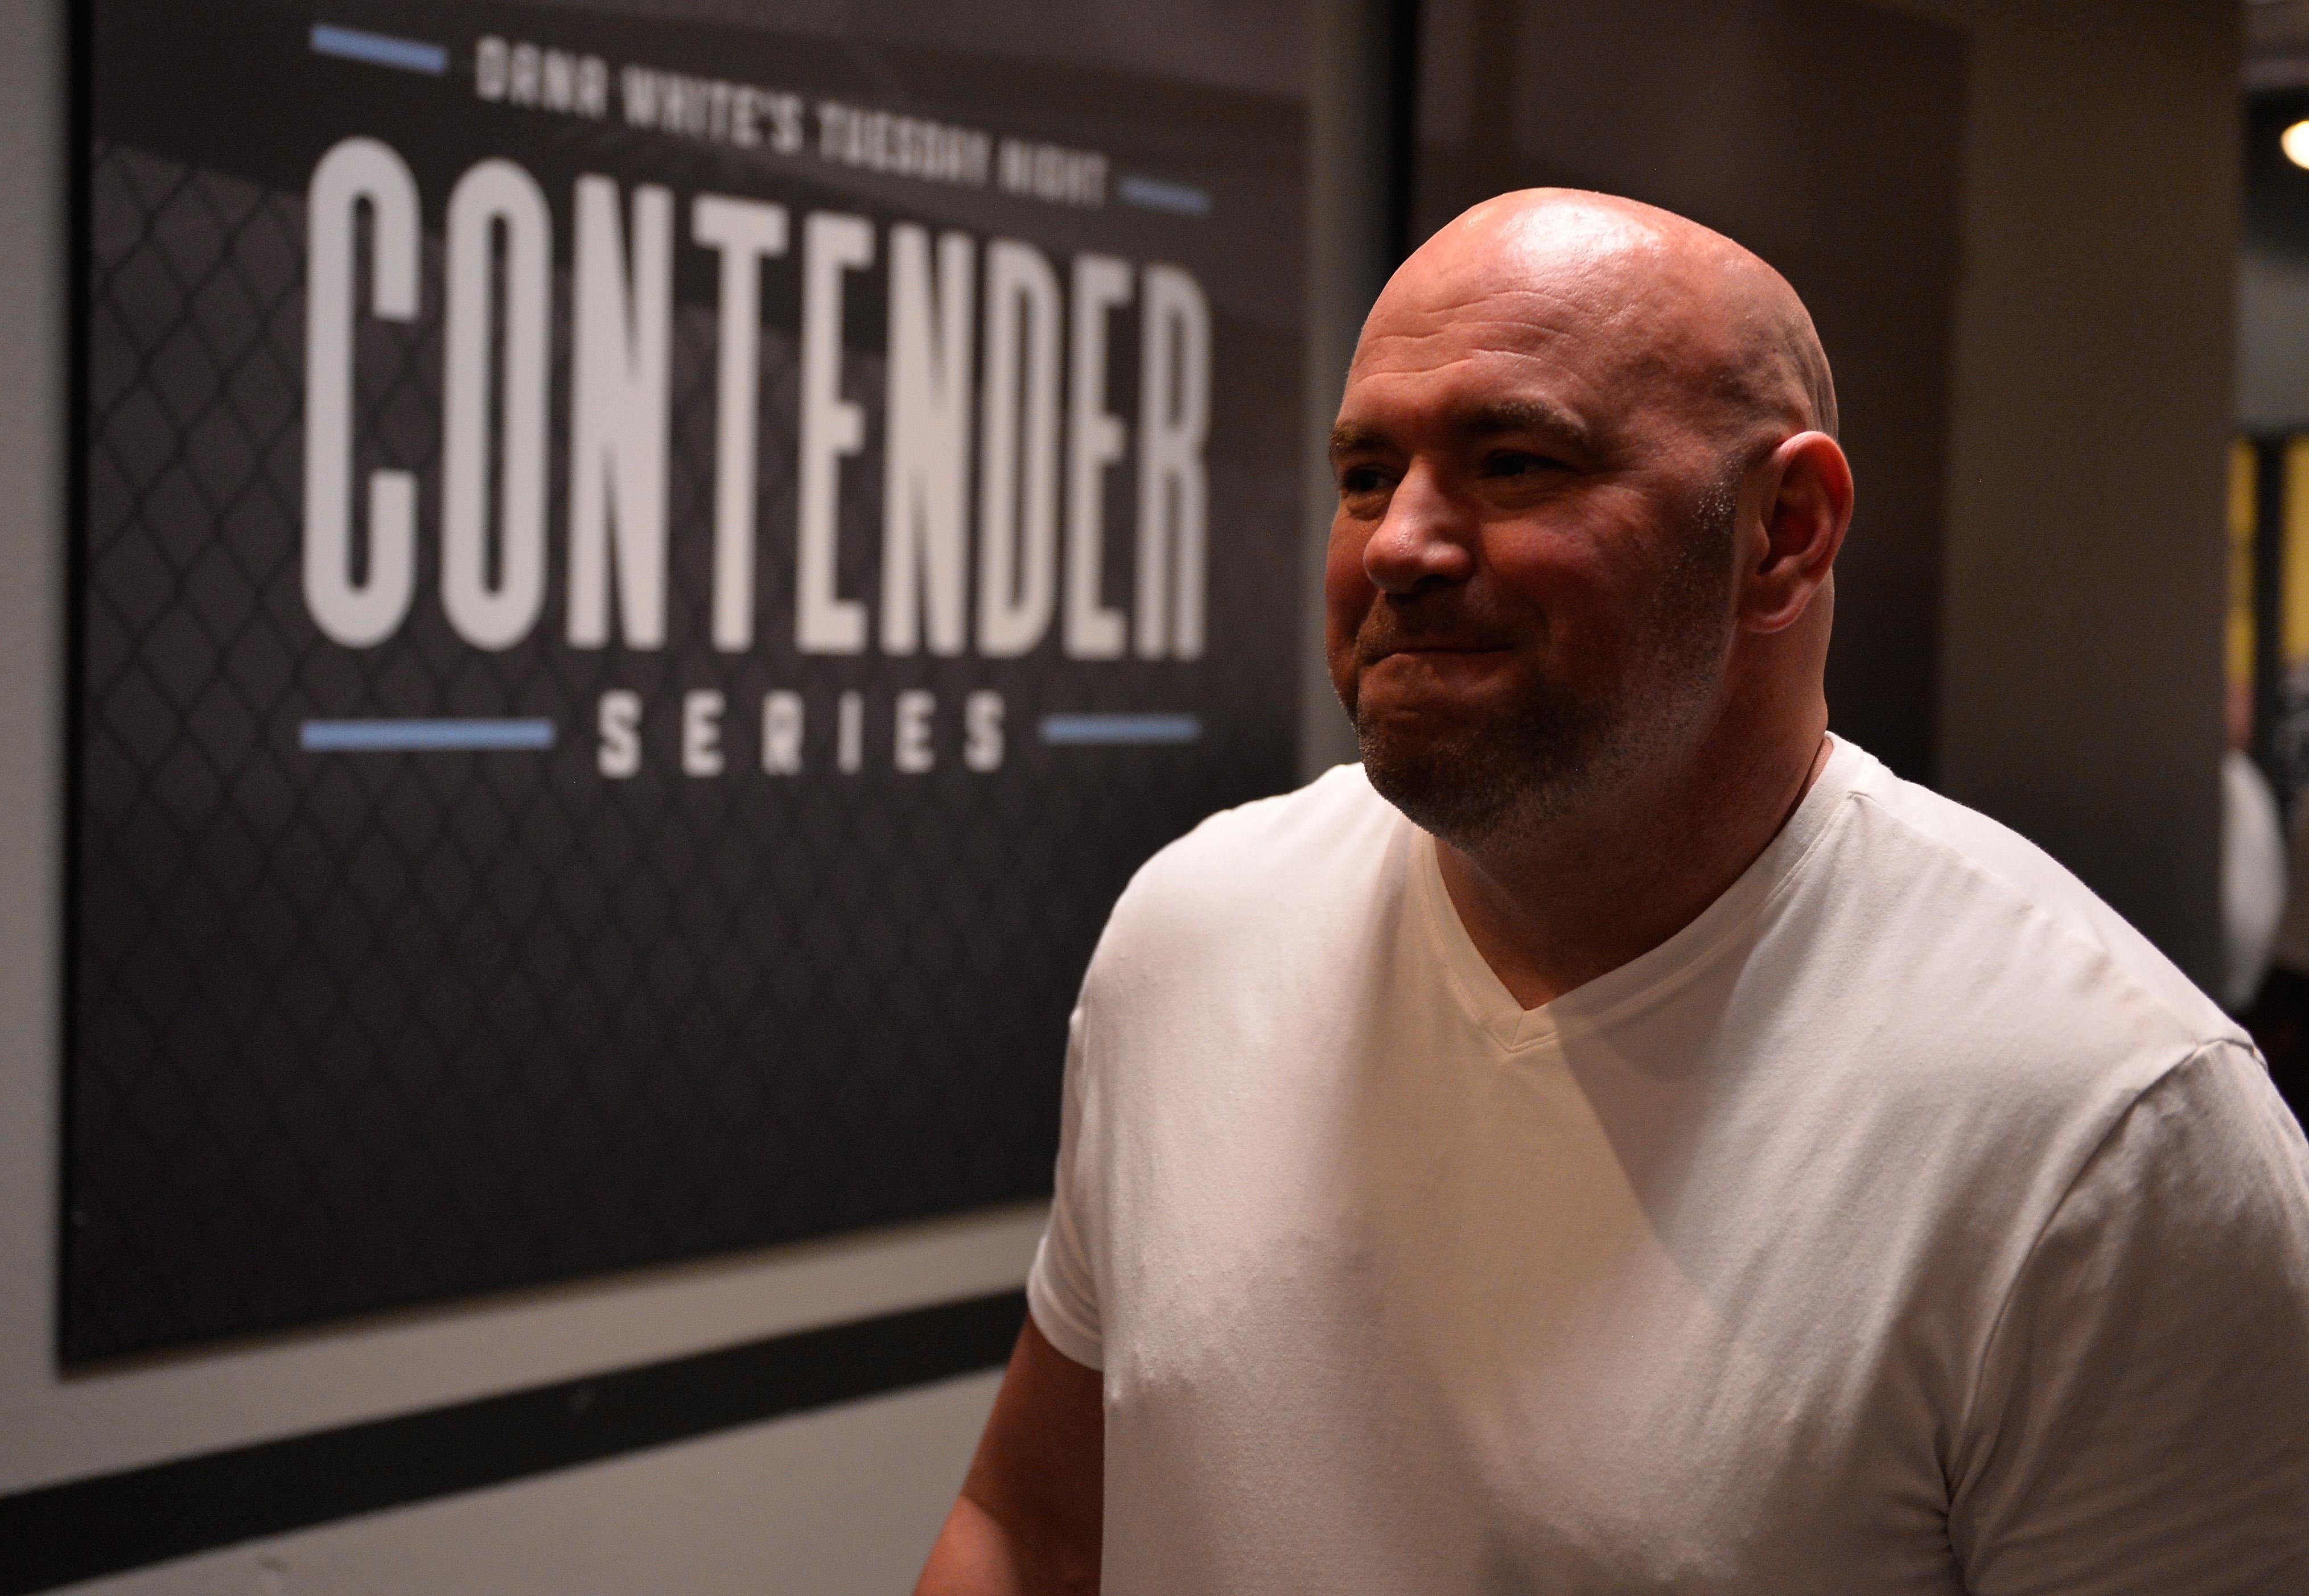 Dana White's Tuesday Night Contender Series: Barber v Colleen